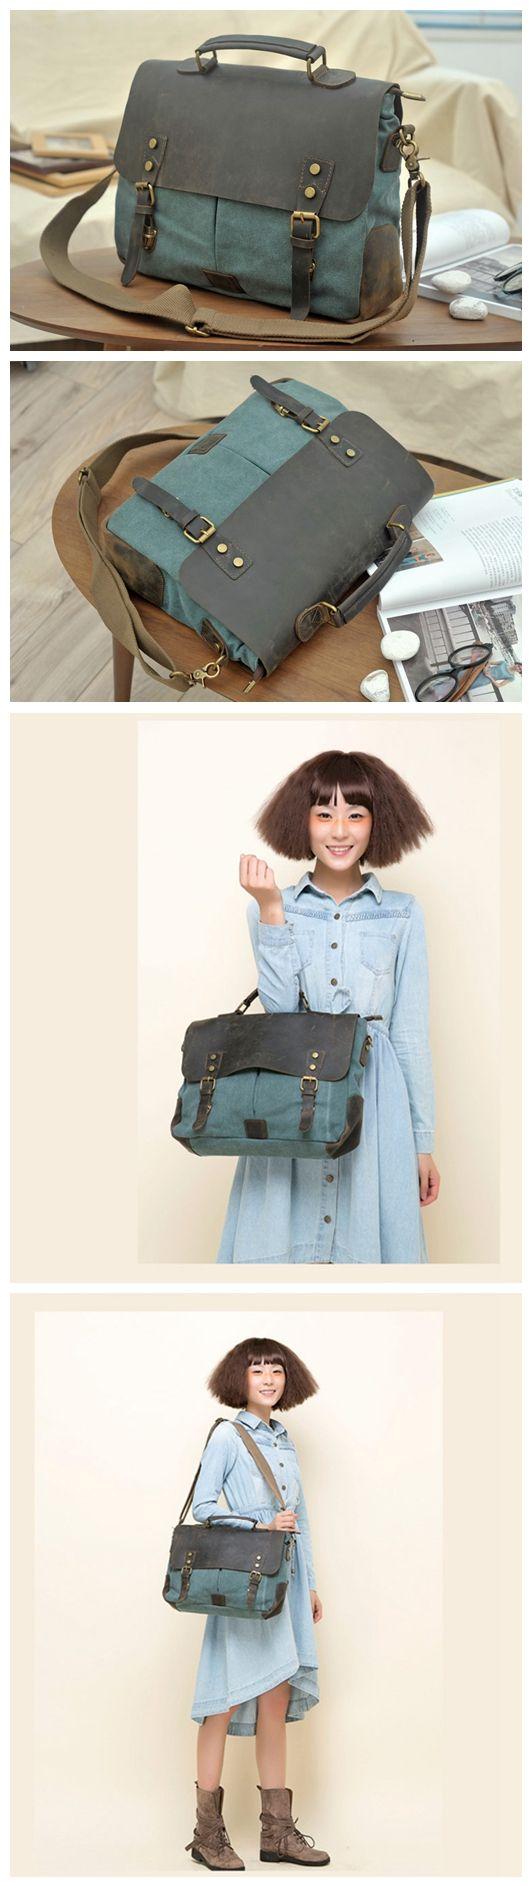 canvas messenger/canvas bag design/canvas case/women fashion/canvas art/canvas design/gift ideas/school bag for teens